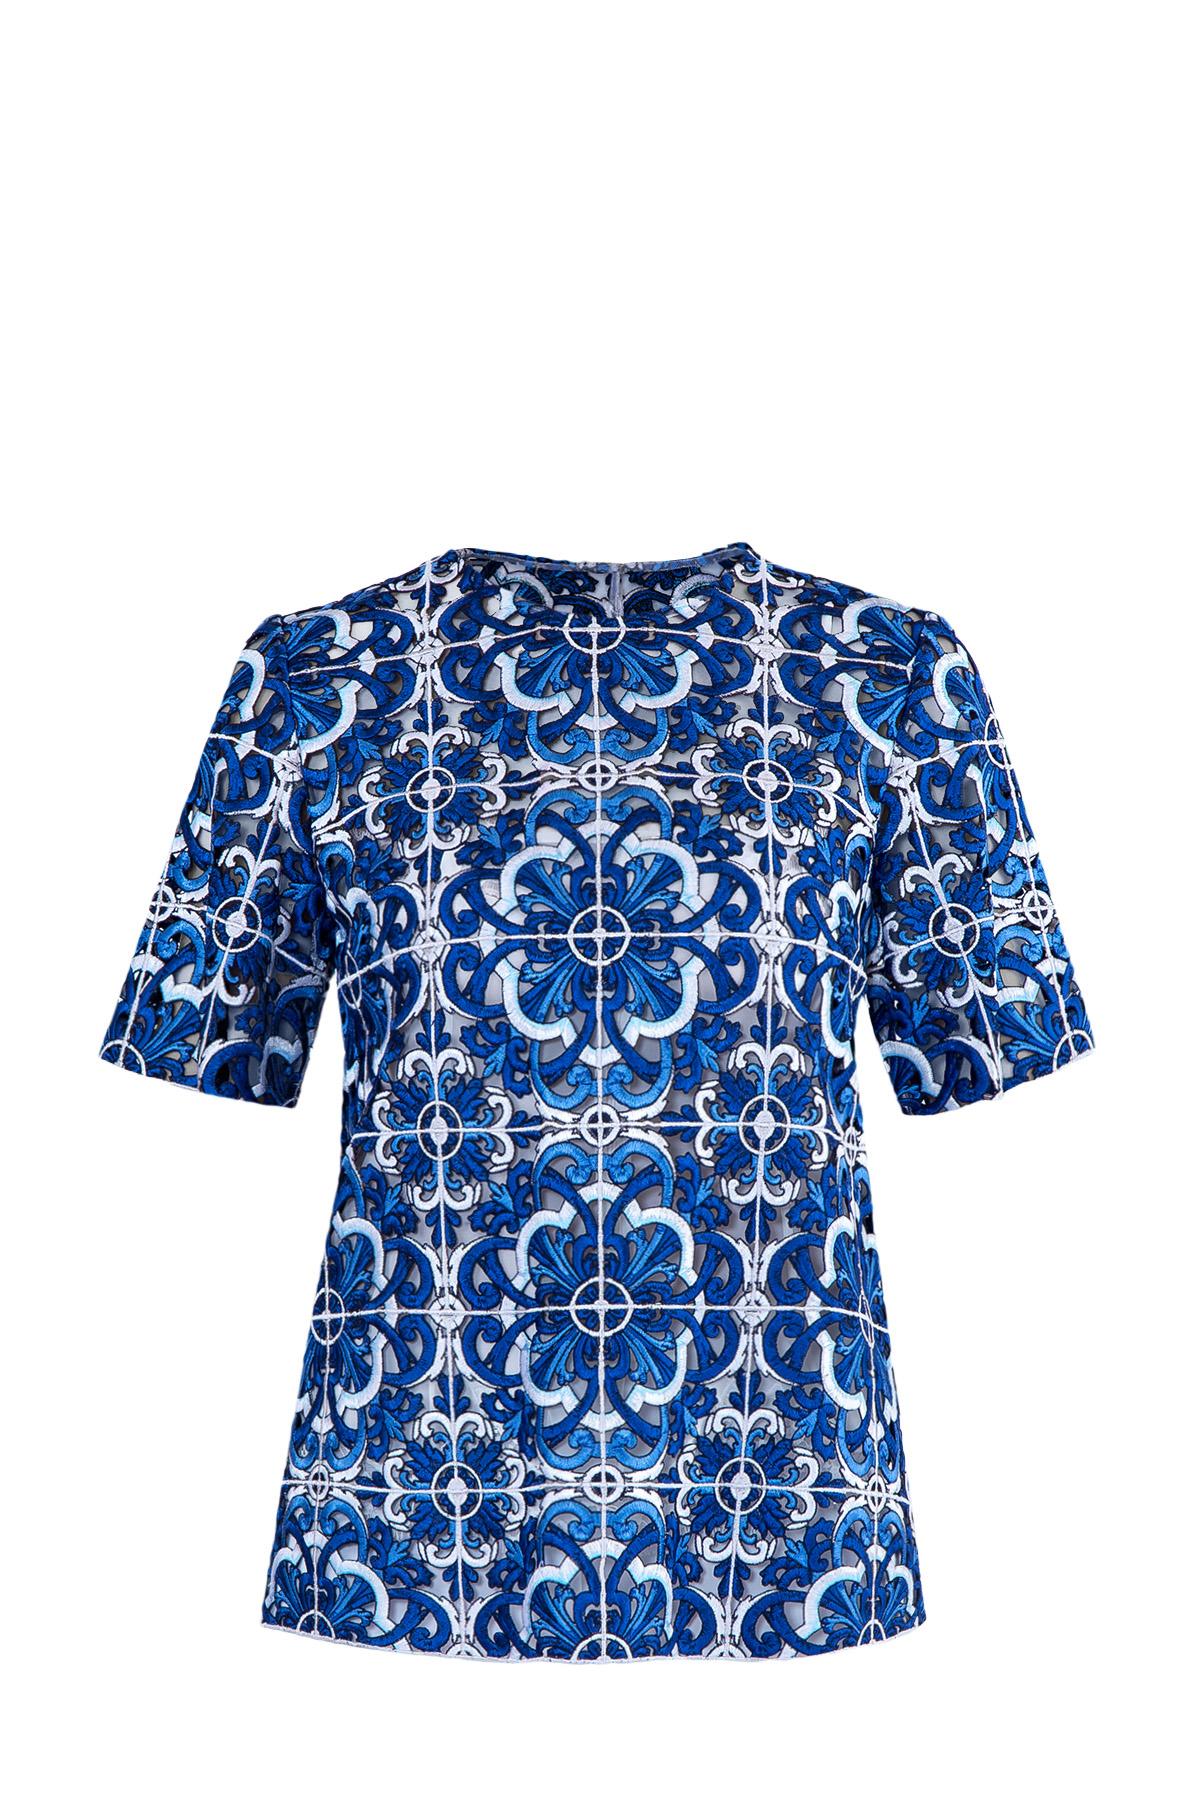 блузкаБлузки, рубашки<br><br>Материал: вискоза 88% ,  полиэстер 12% ,  шелк 76% ,  хлопок 16% ,  полиамид 4% ,  эластан 4%;